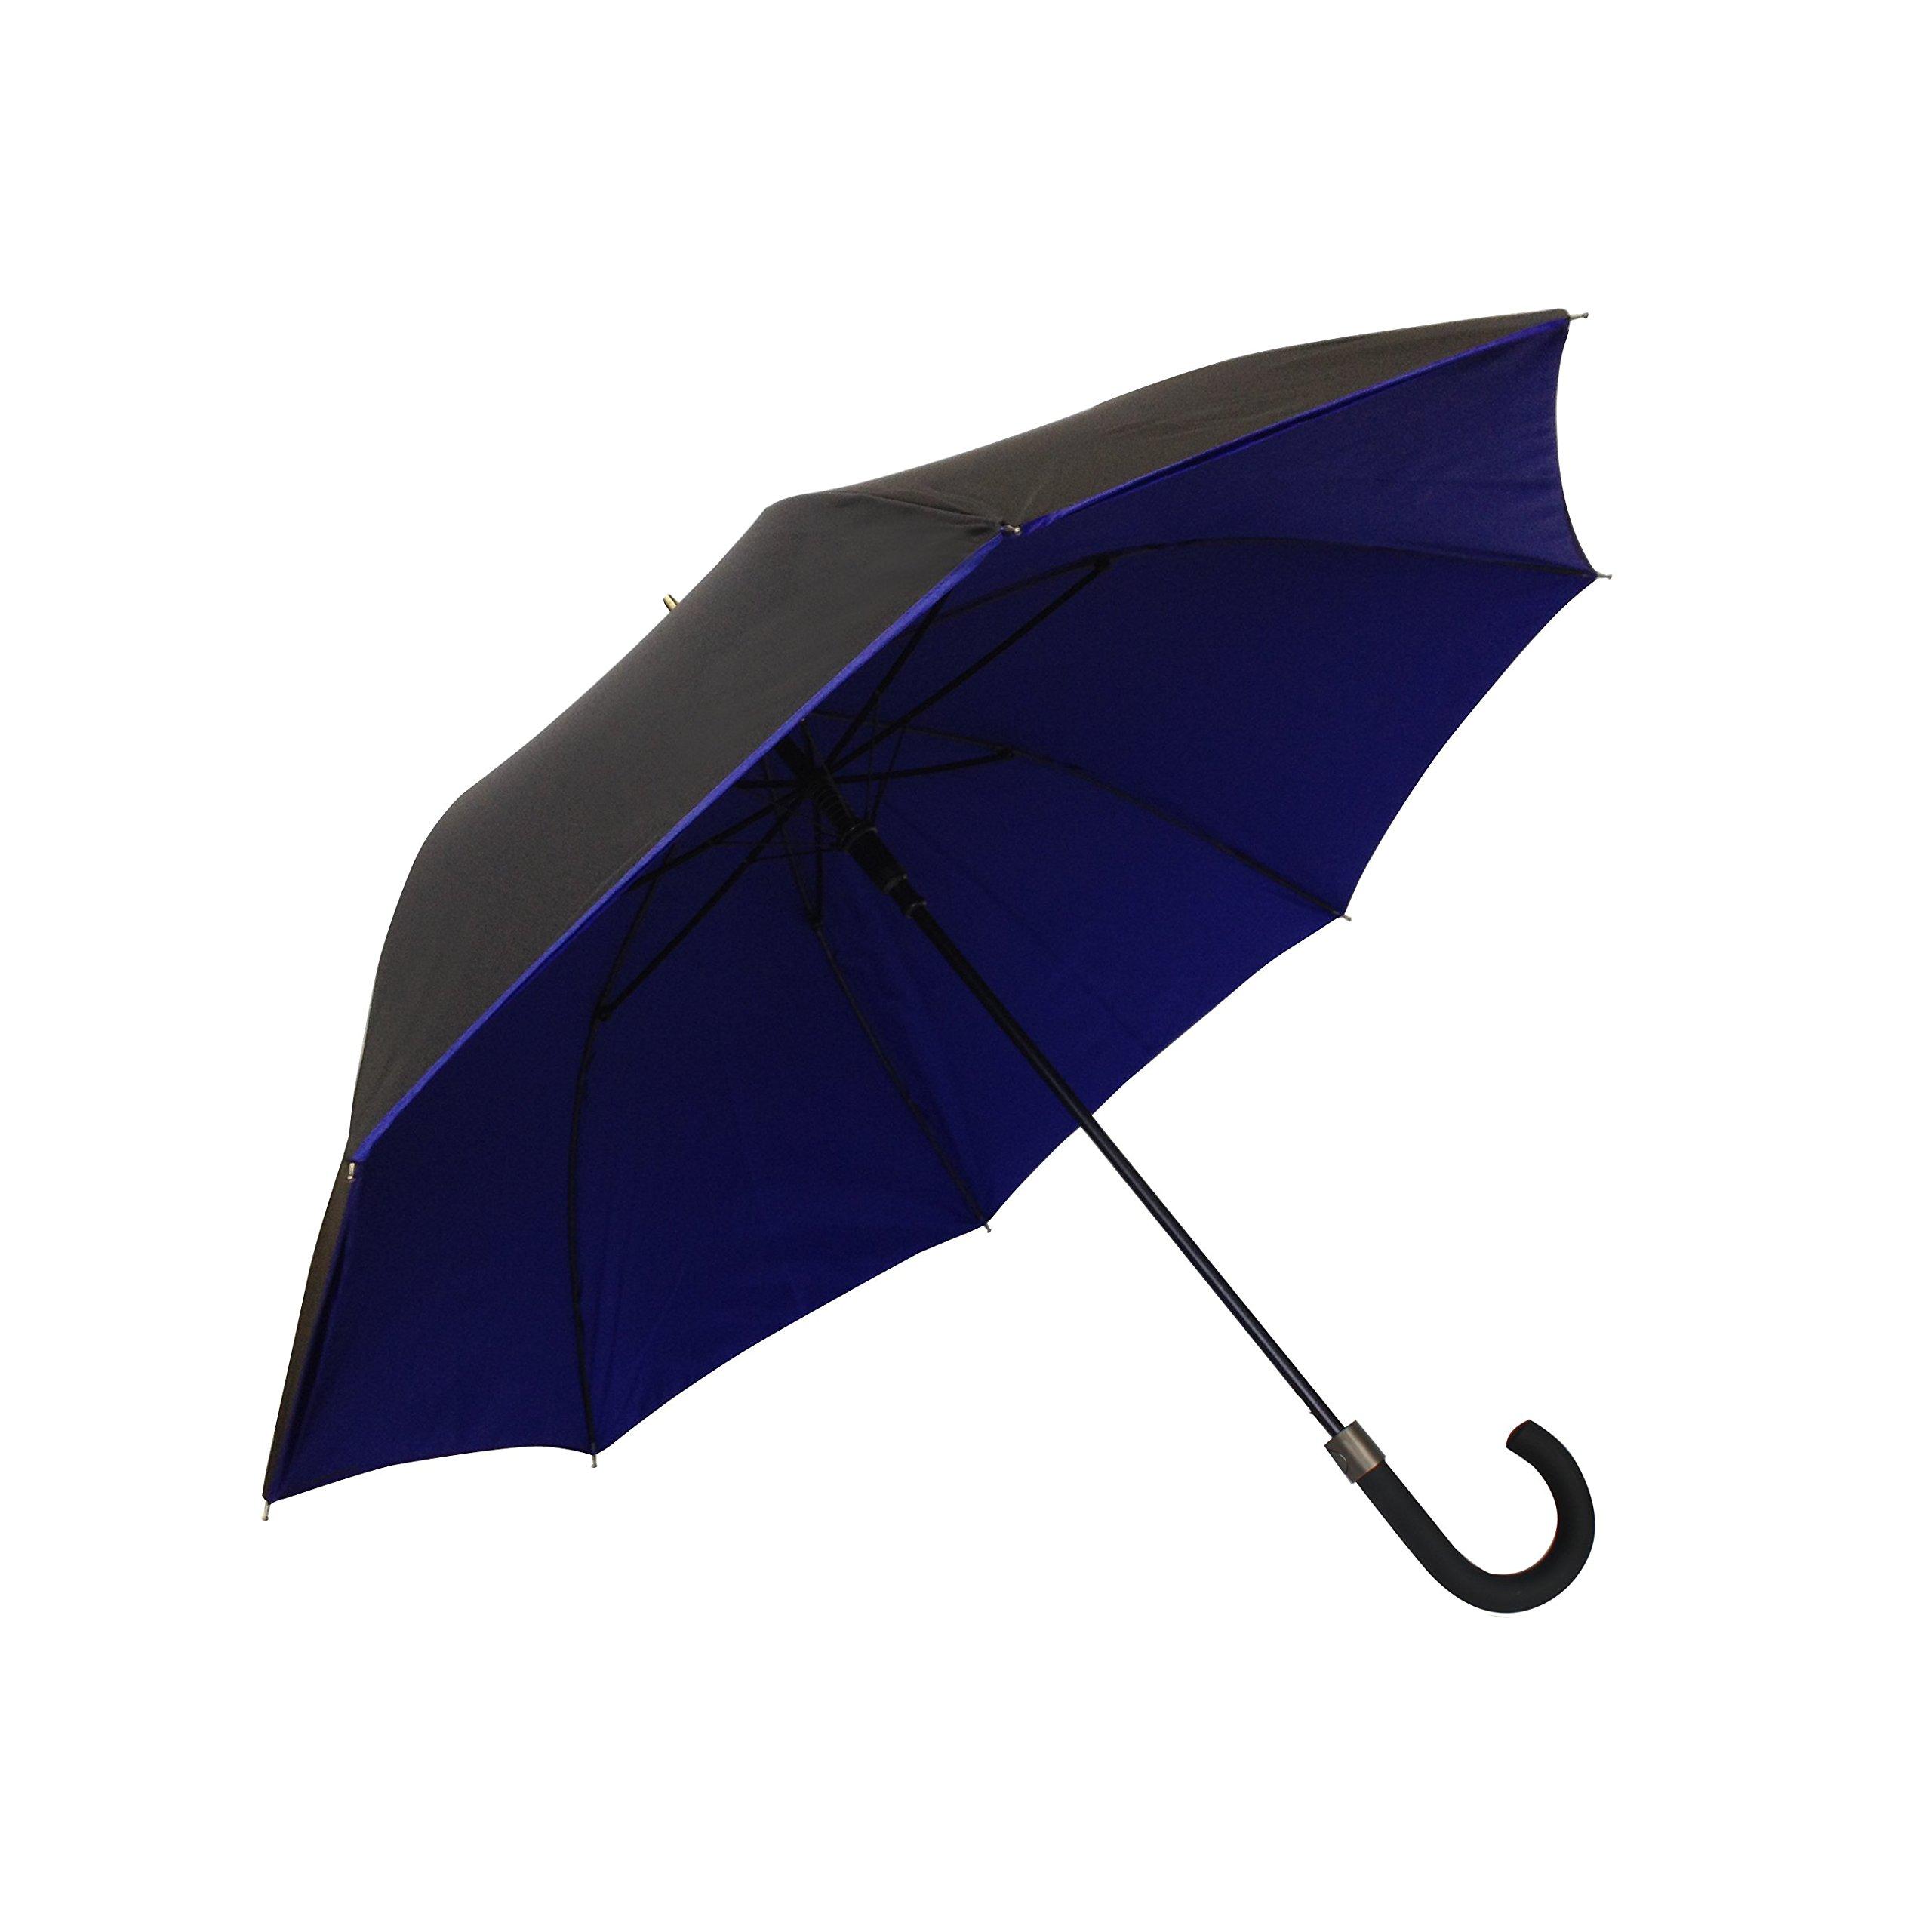 SMATI Stick Umbrella - Double Layers - French Design - Fashion - Sturdy - 8 fibreglass ribs Windproof - color (Electric Blue-black)